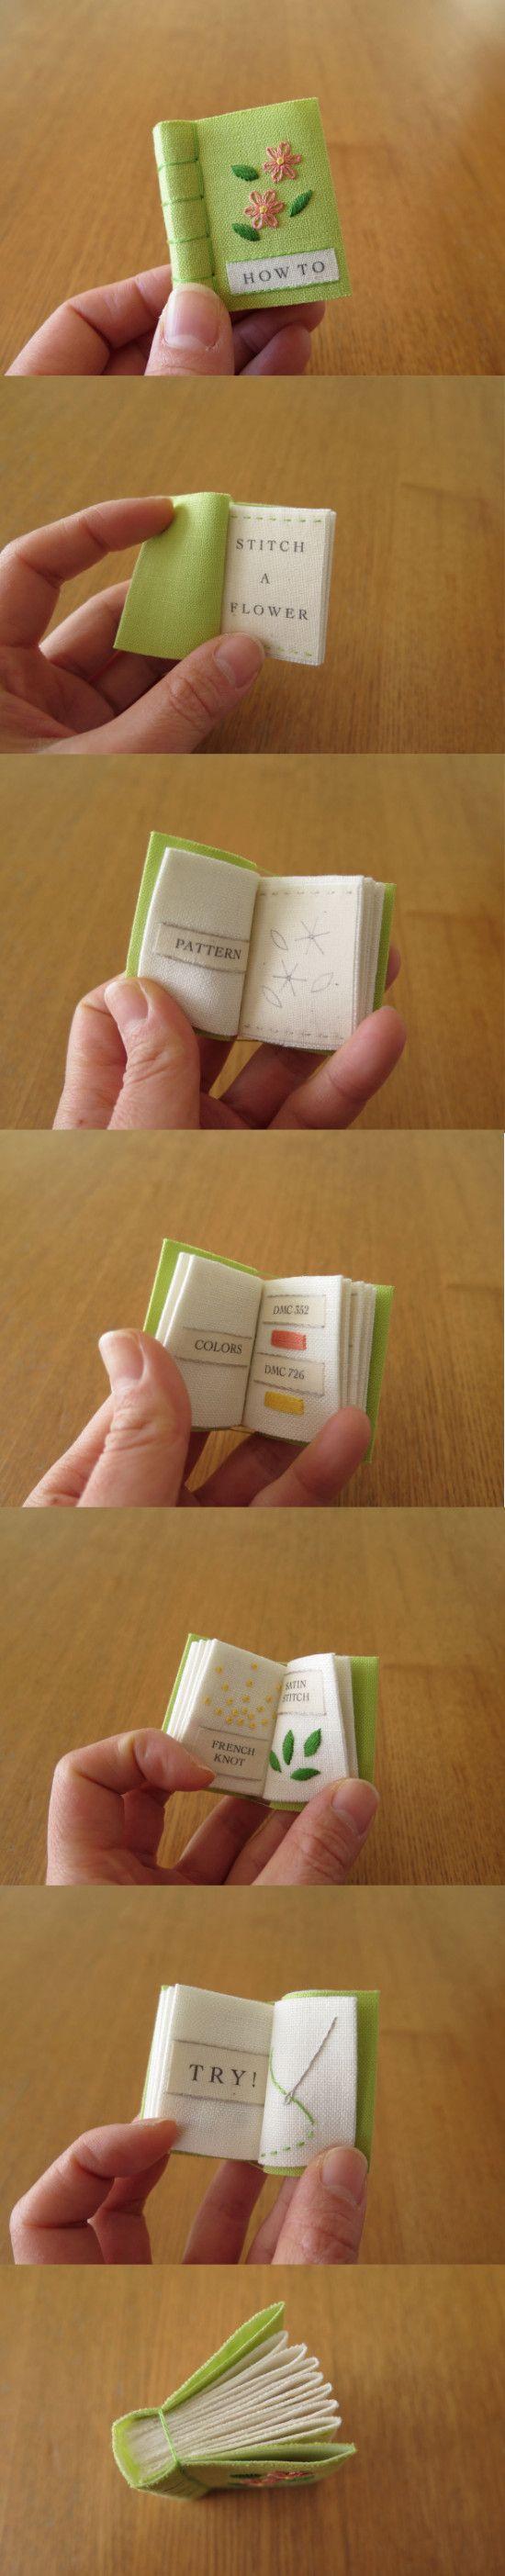 """How to Stitch a Flower.""by Yuki Sugashima who lives in Saitama, Japan."